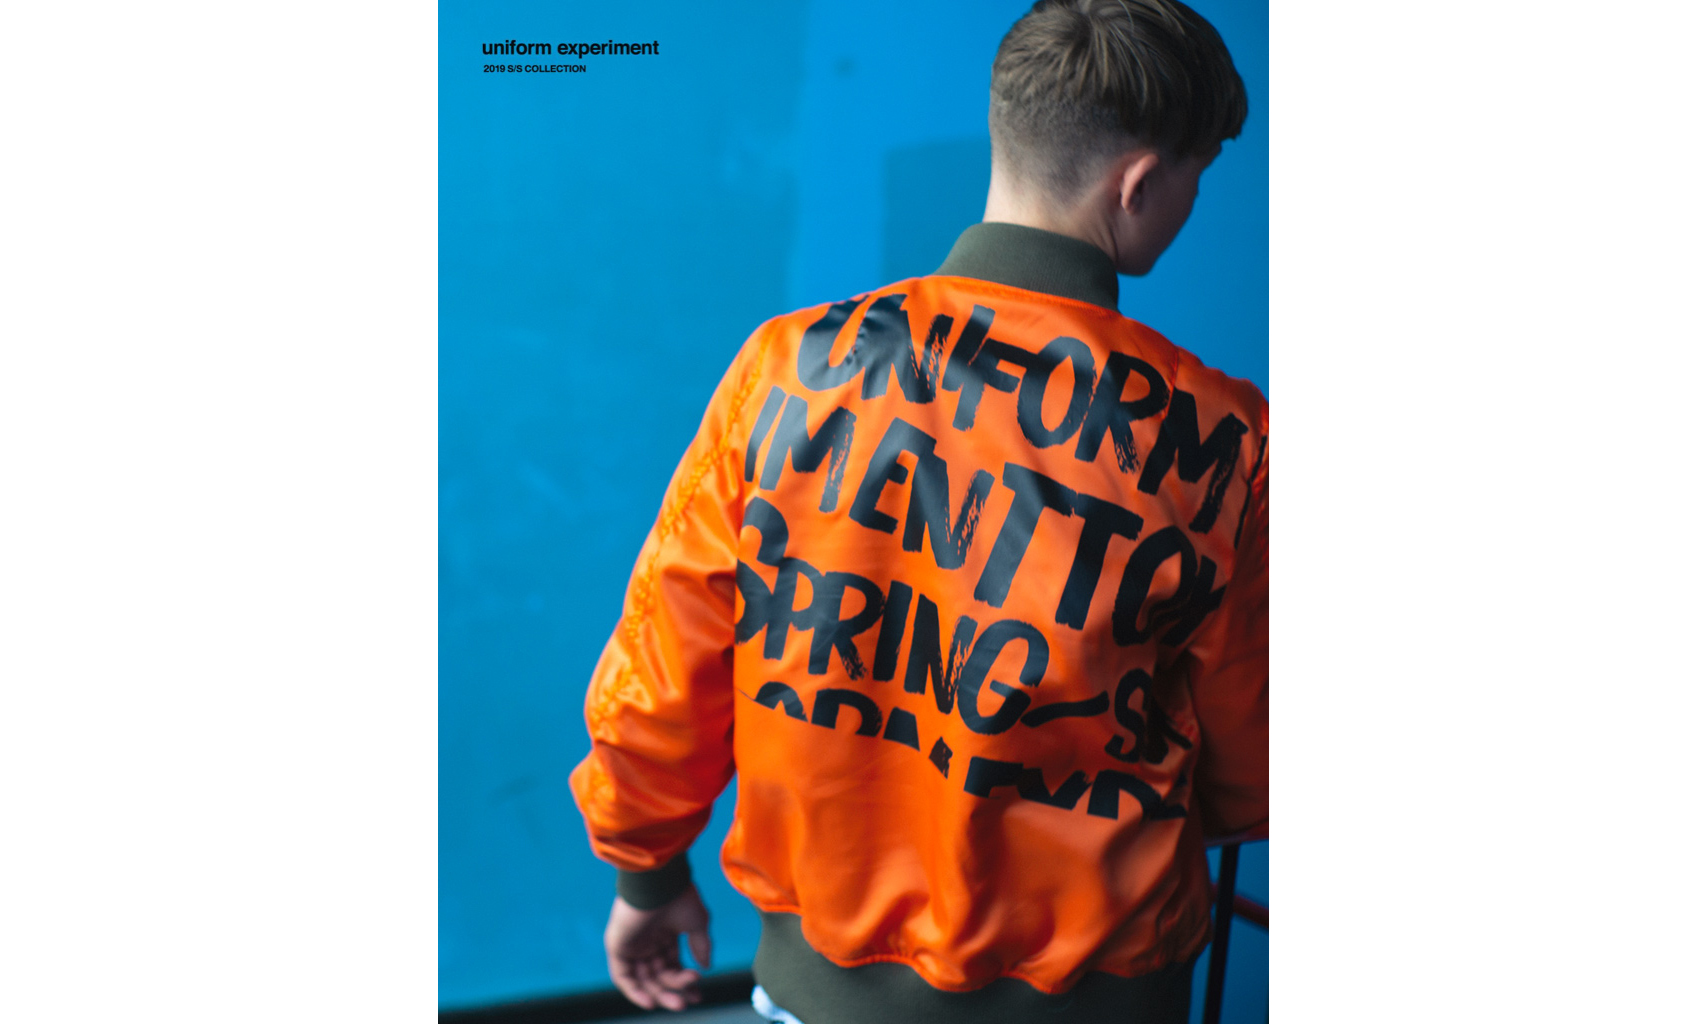 uniform experiment 2019 春夏系列 Lookbook 释出